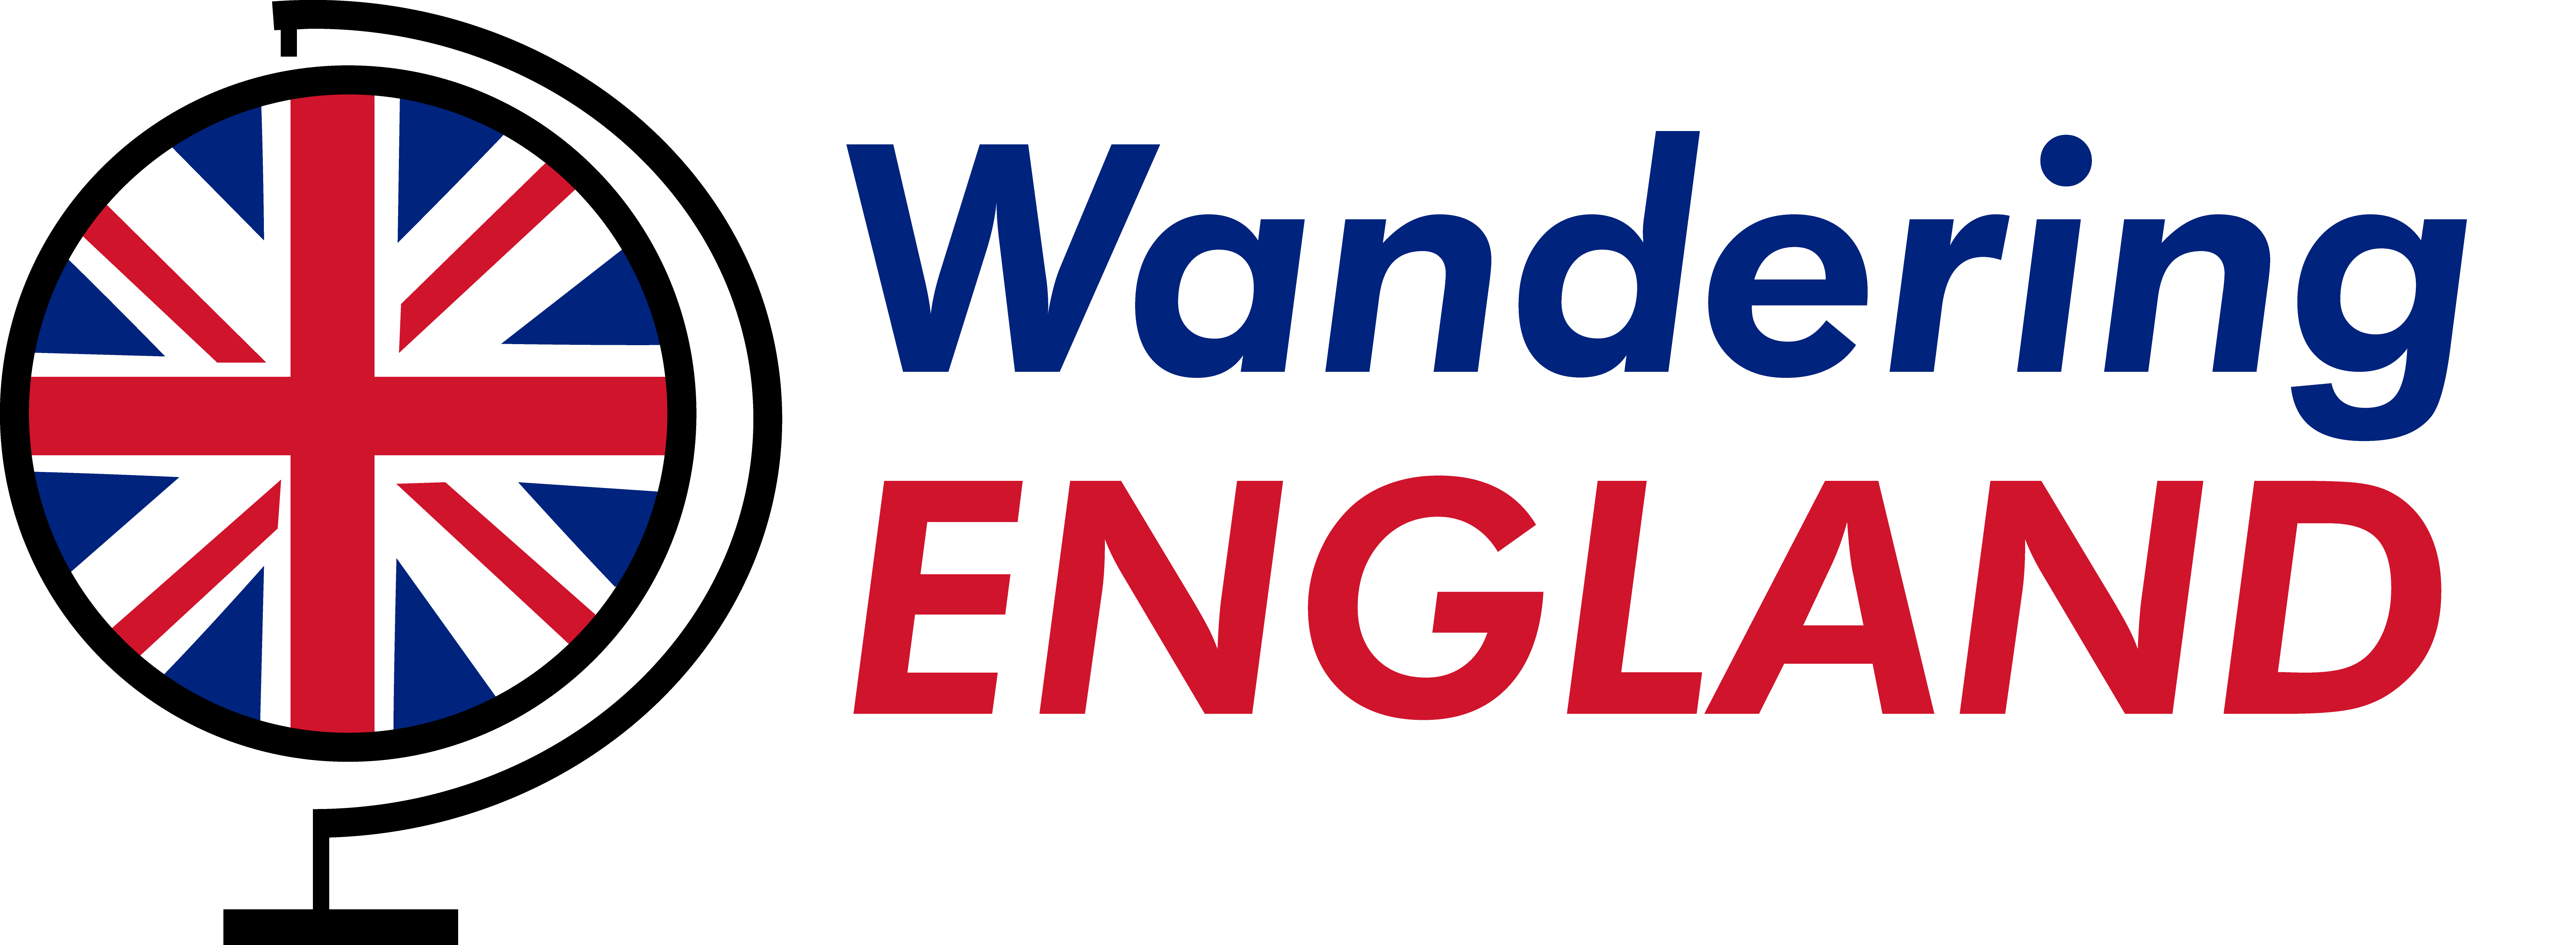 Wandering England